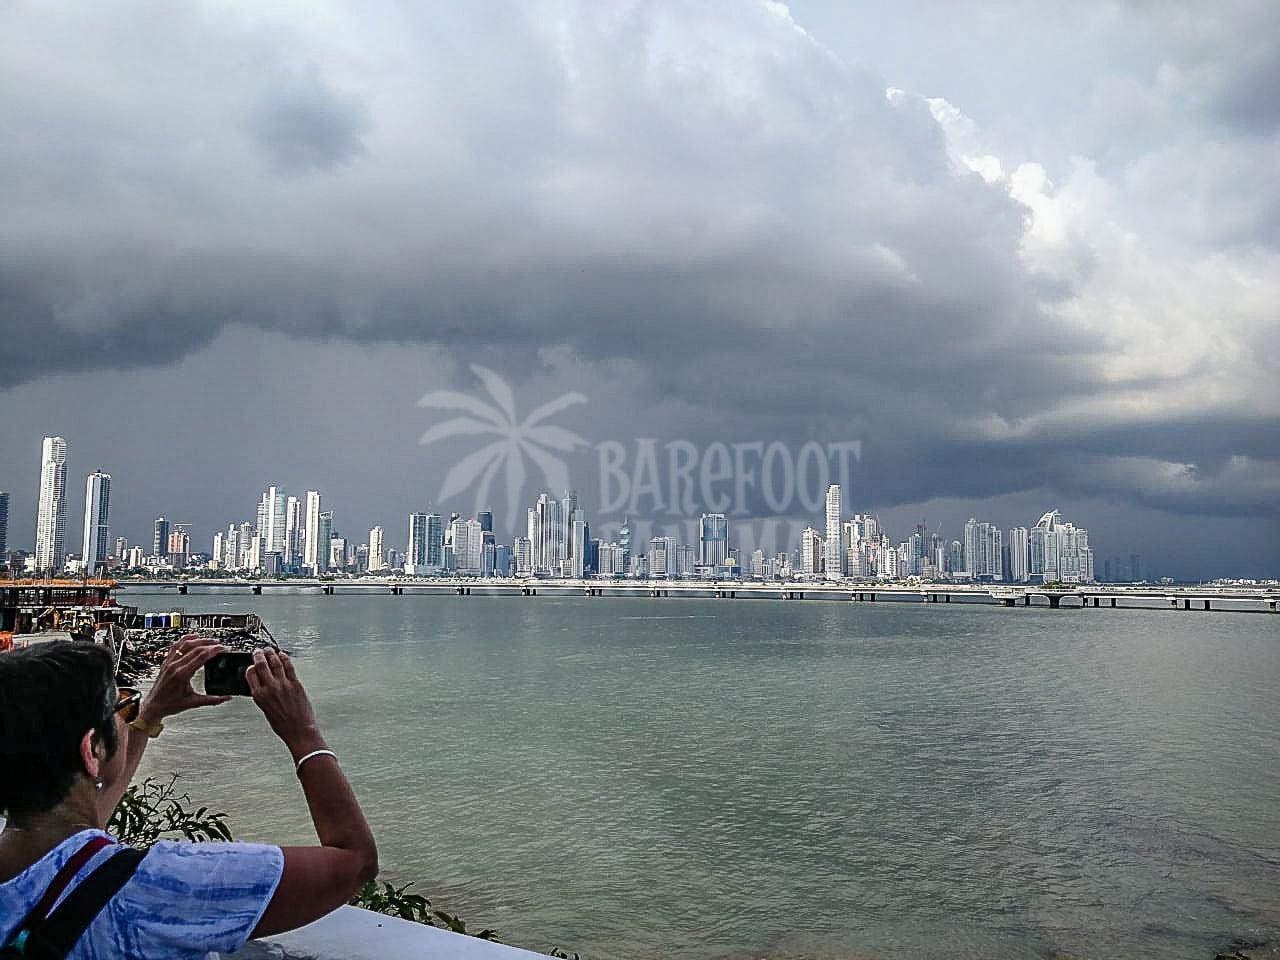 Panama-city-from-across-the-bay